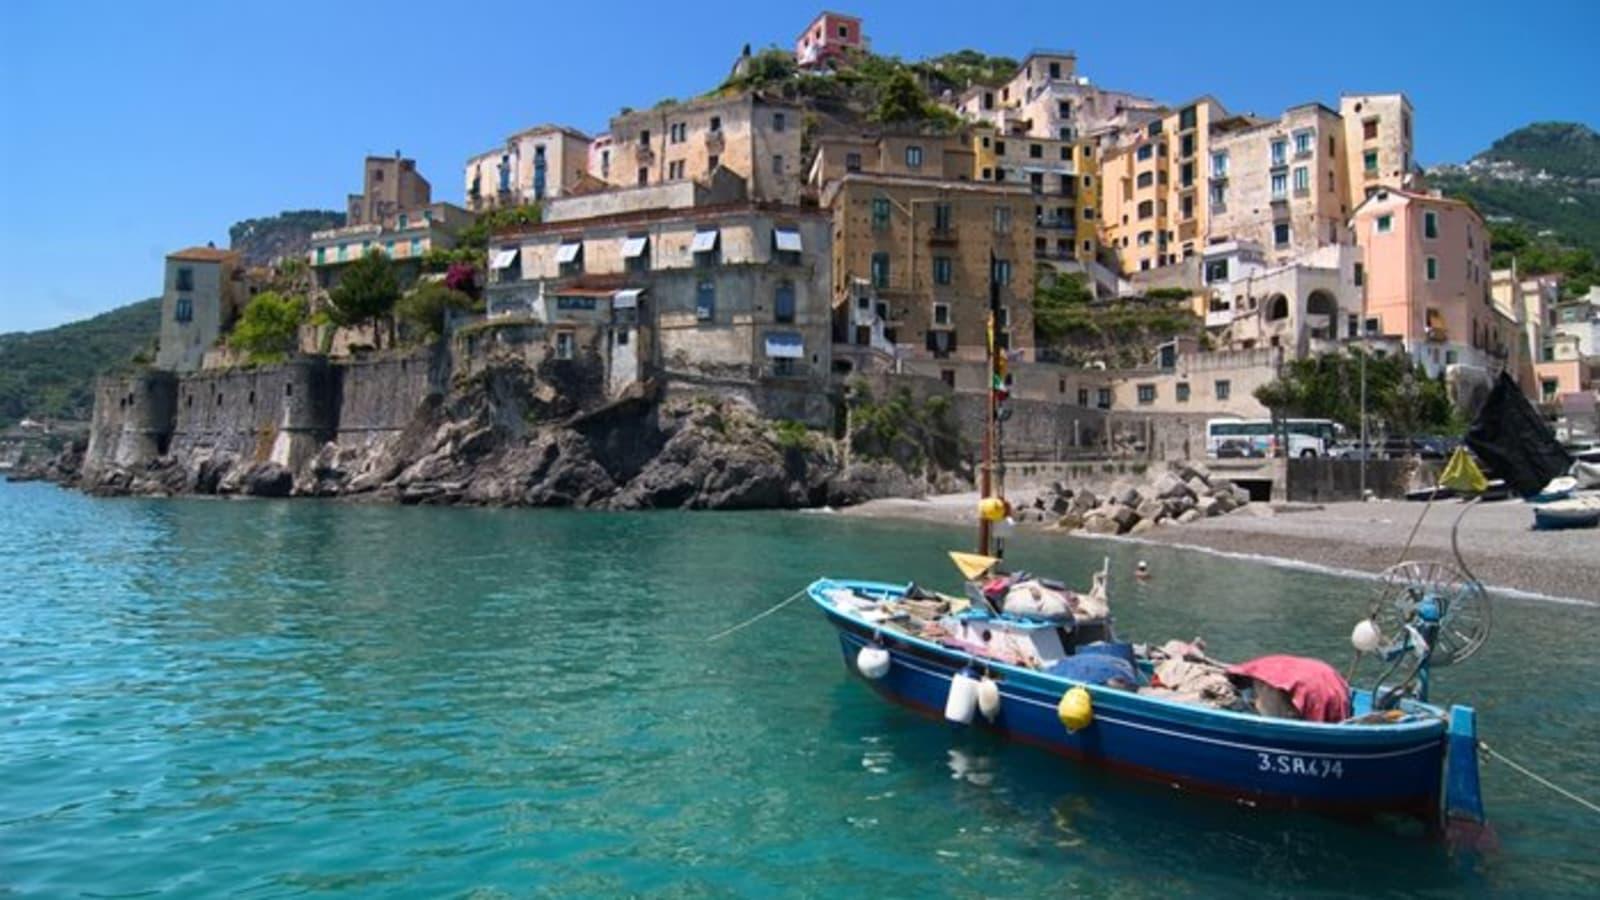 Minori holidays in the amalfi coast topflight for Italia amalfi